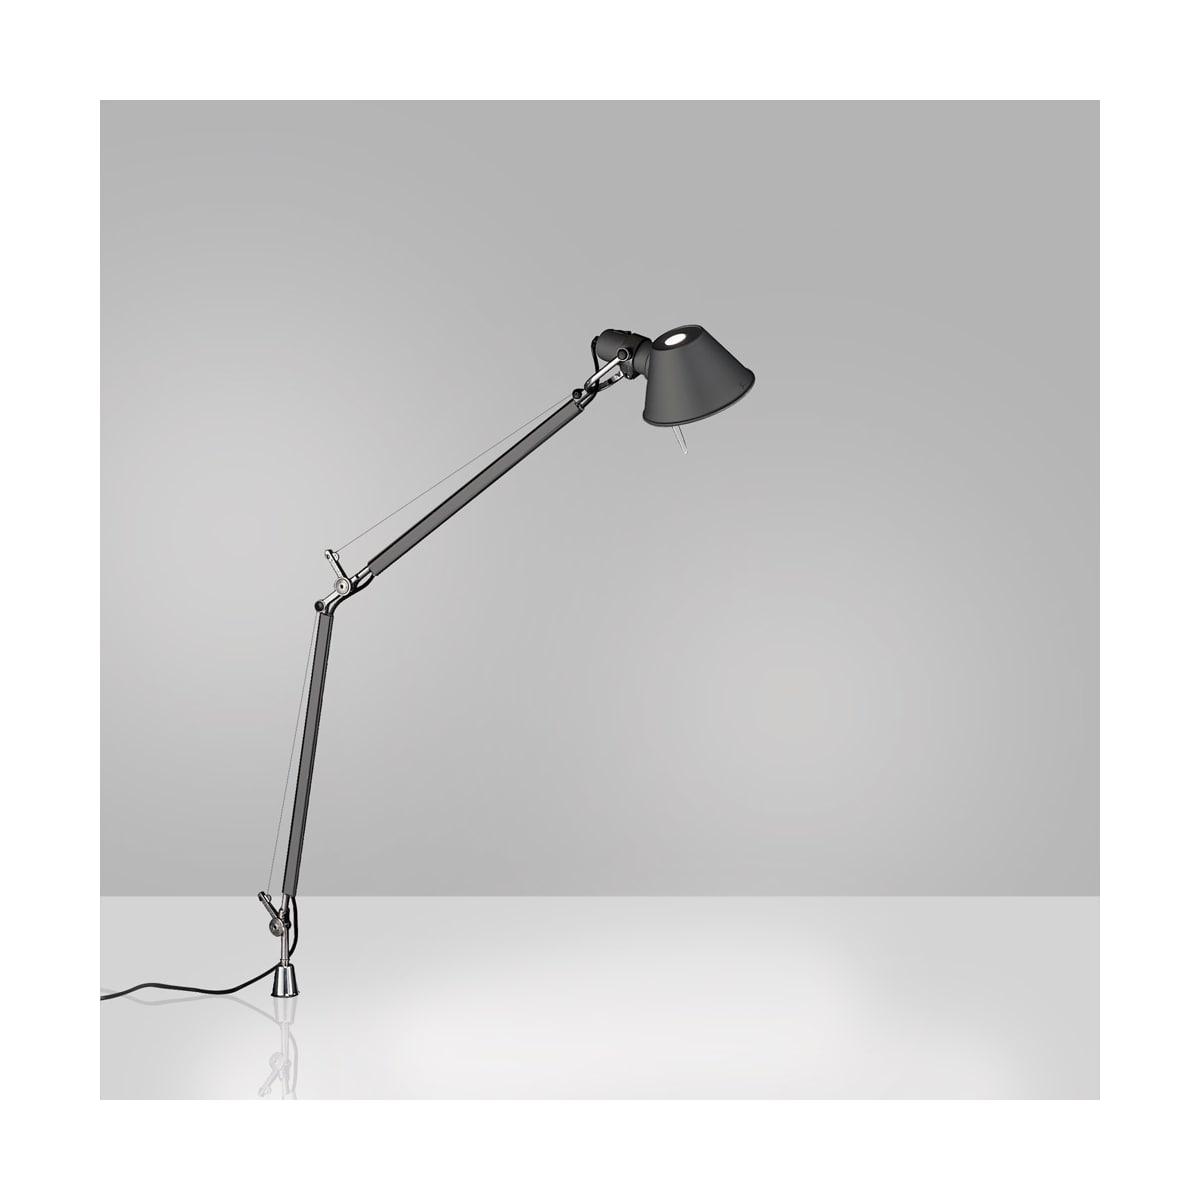 Artemide Usc Tol0083 Anthracite Grey 3000k 80cri Tolomeo Single Light 19 11 16 Tall Integrated Led Swing Arm Table Lamp With Aluminum In Set Pivot Lightingshowplace Com